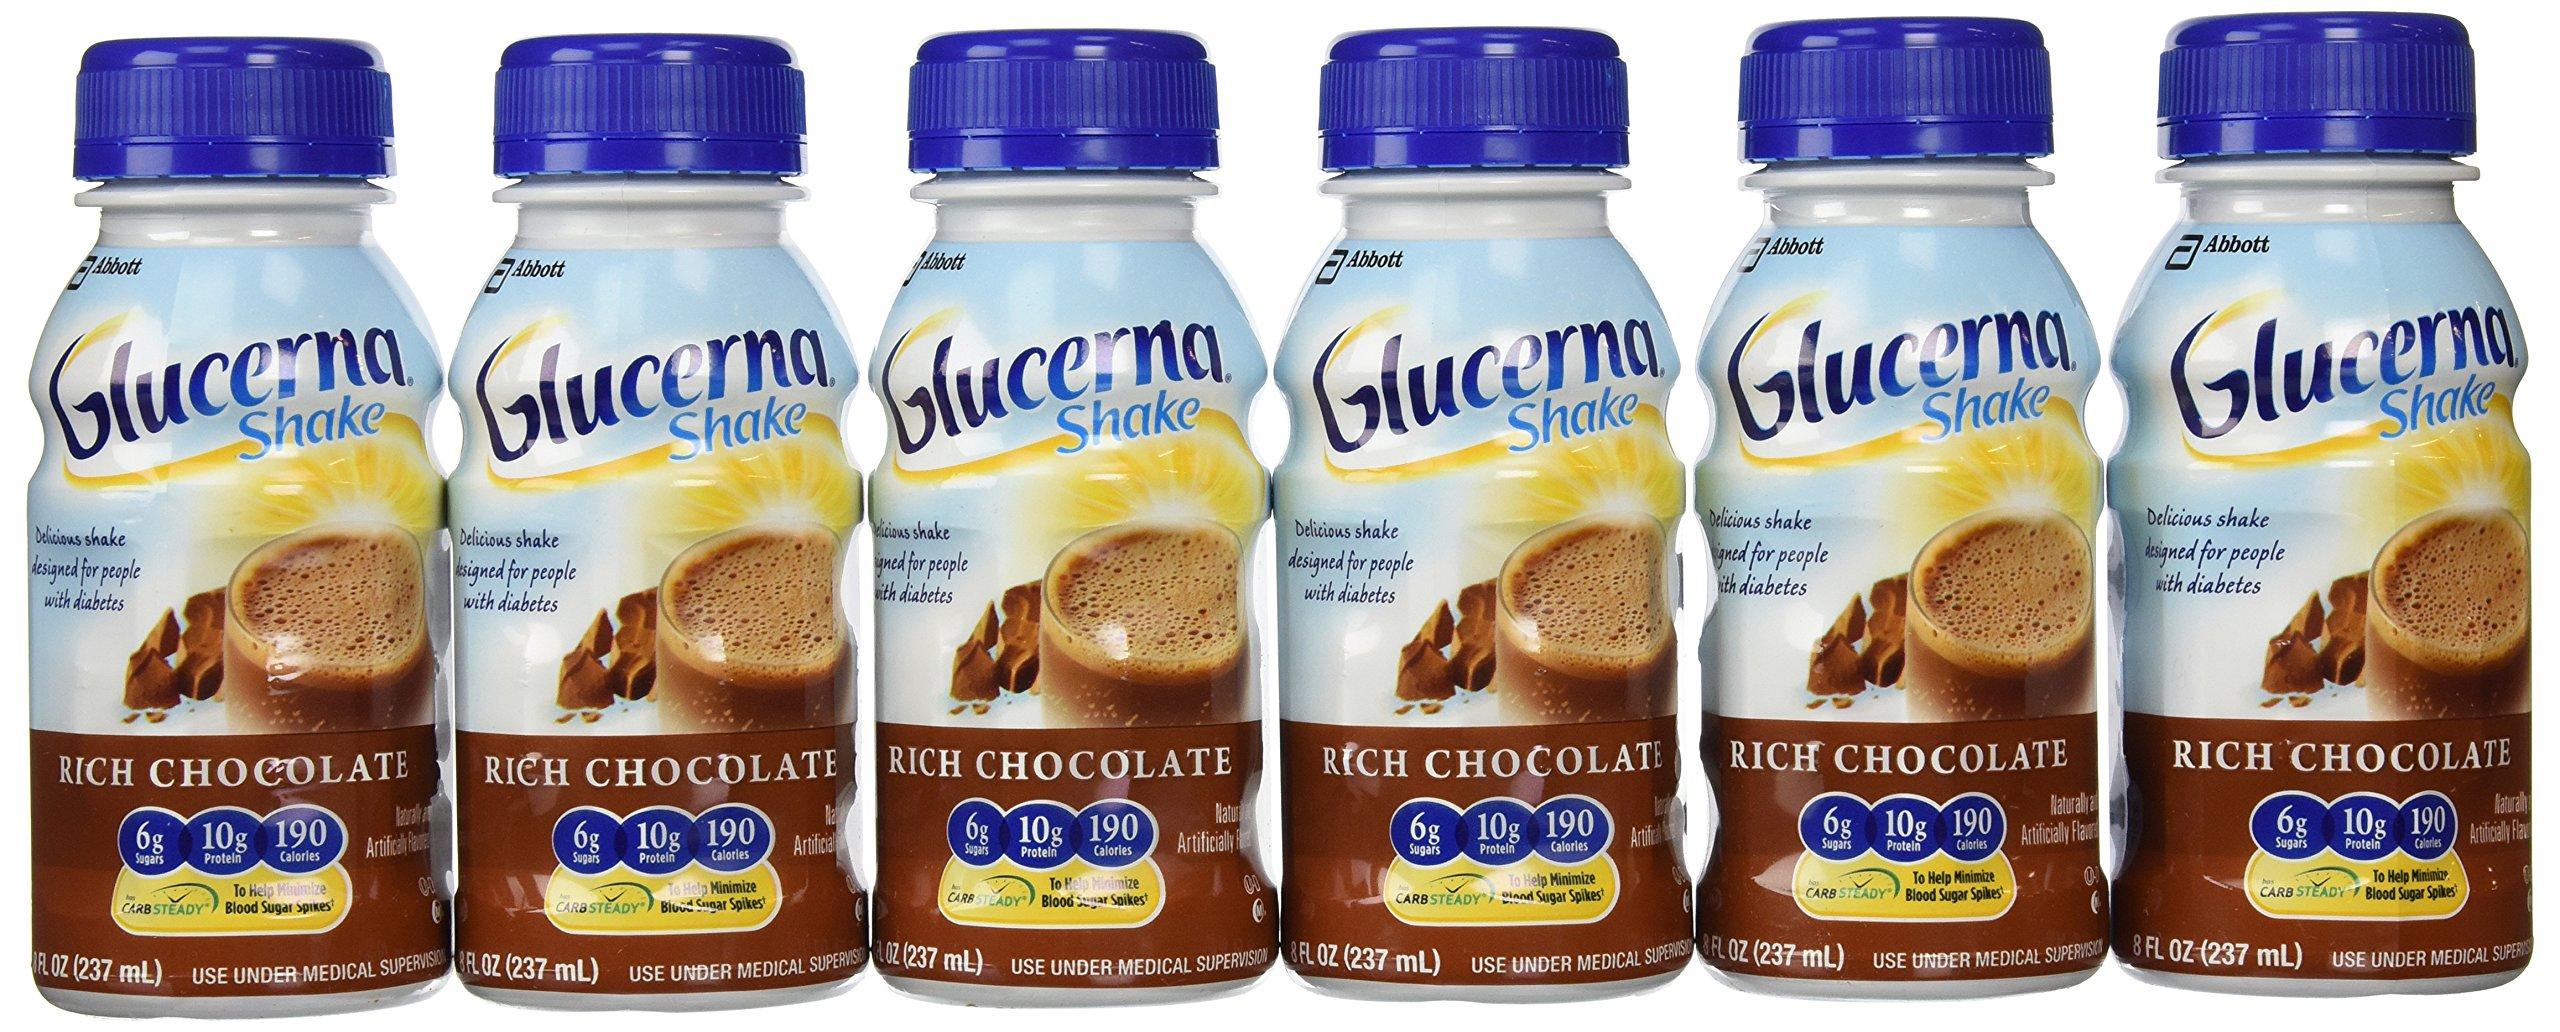 Glucerna Shake Rich Chocolate, 24 Count